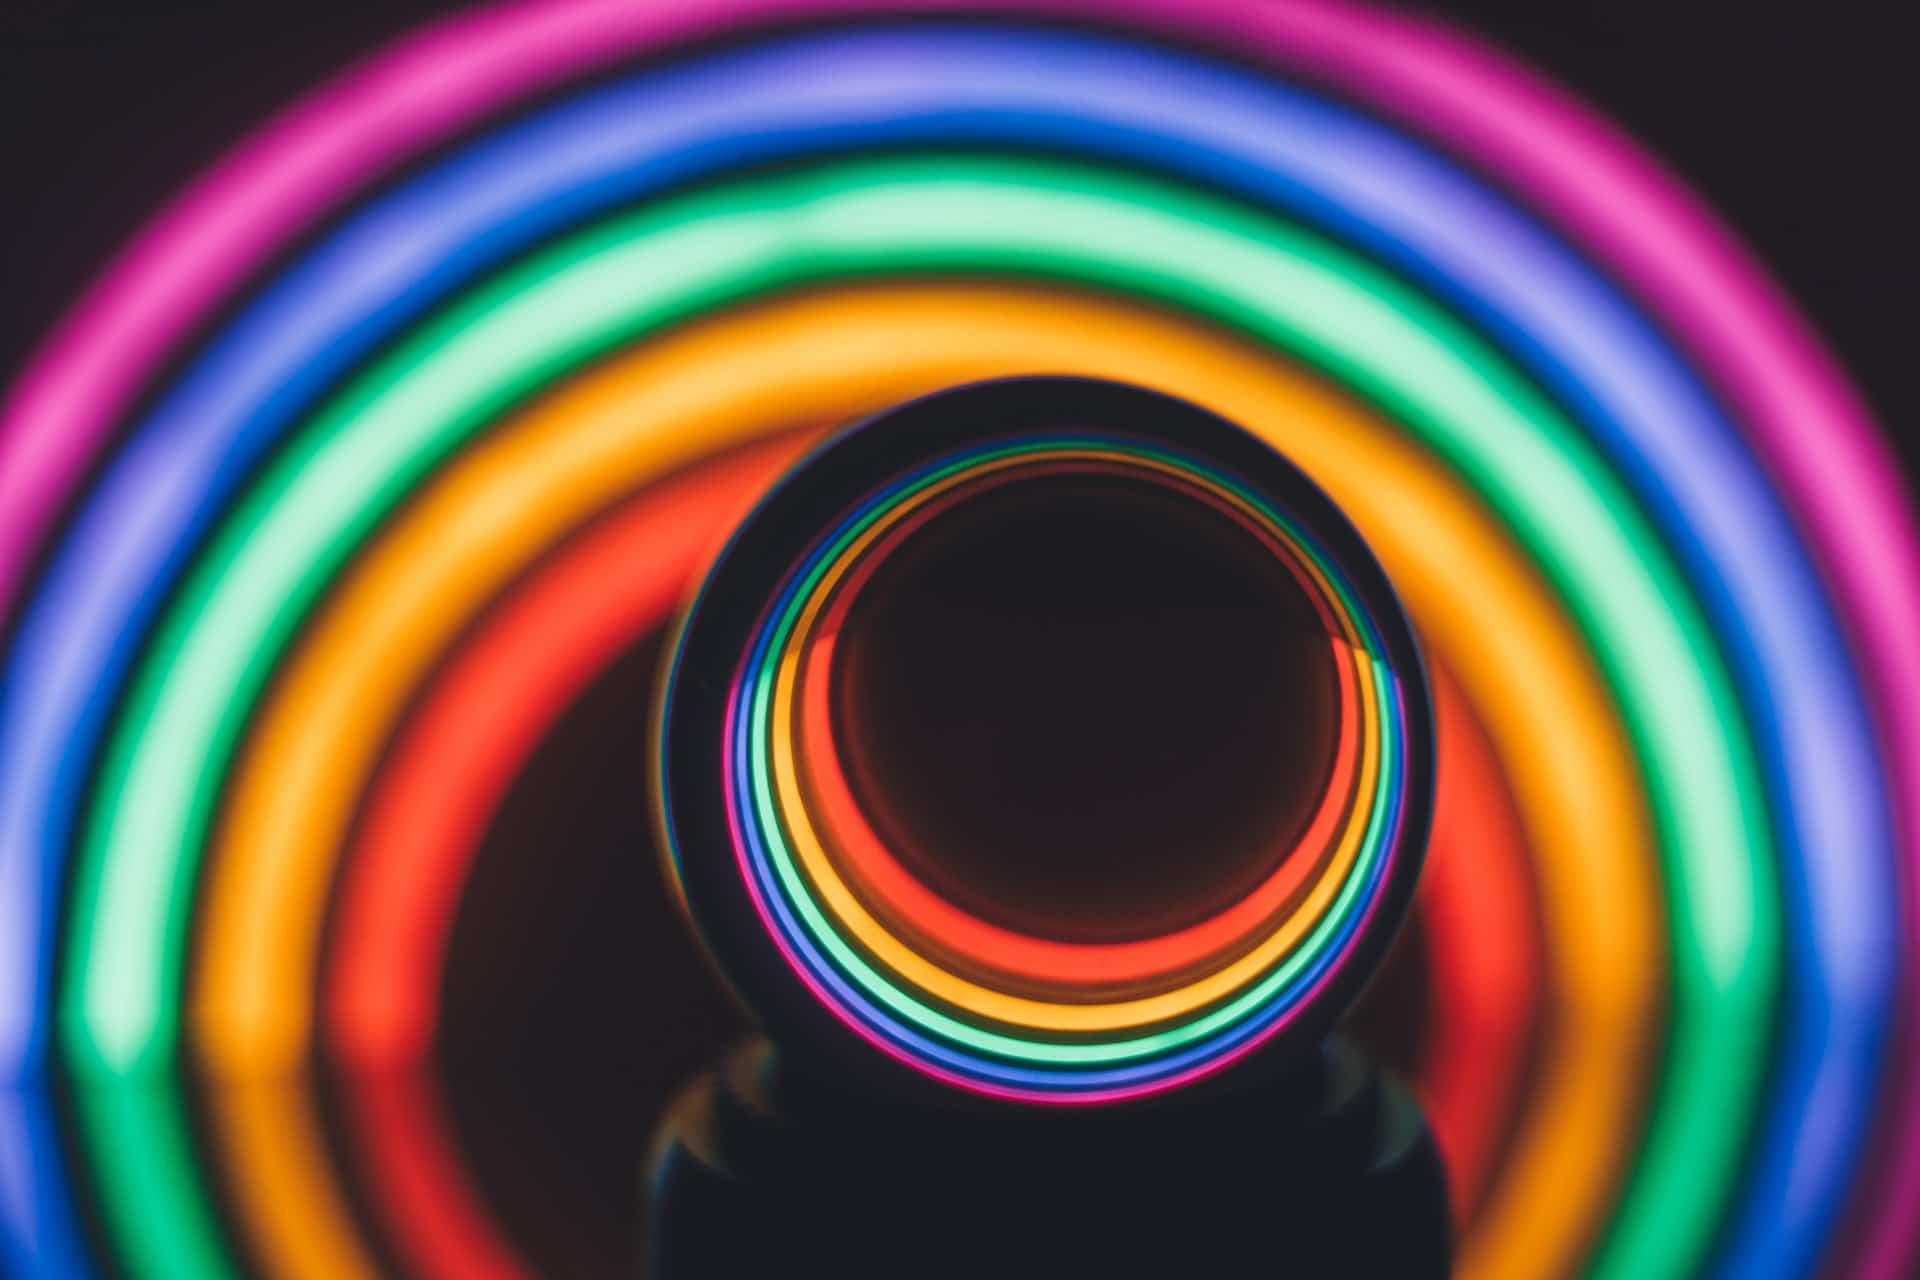 fondation cherqui jean art néons illusions visuels